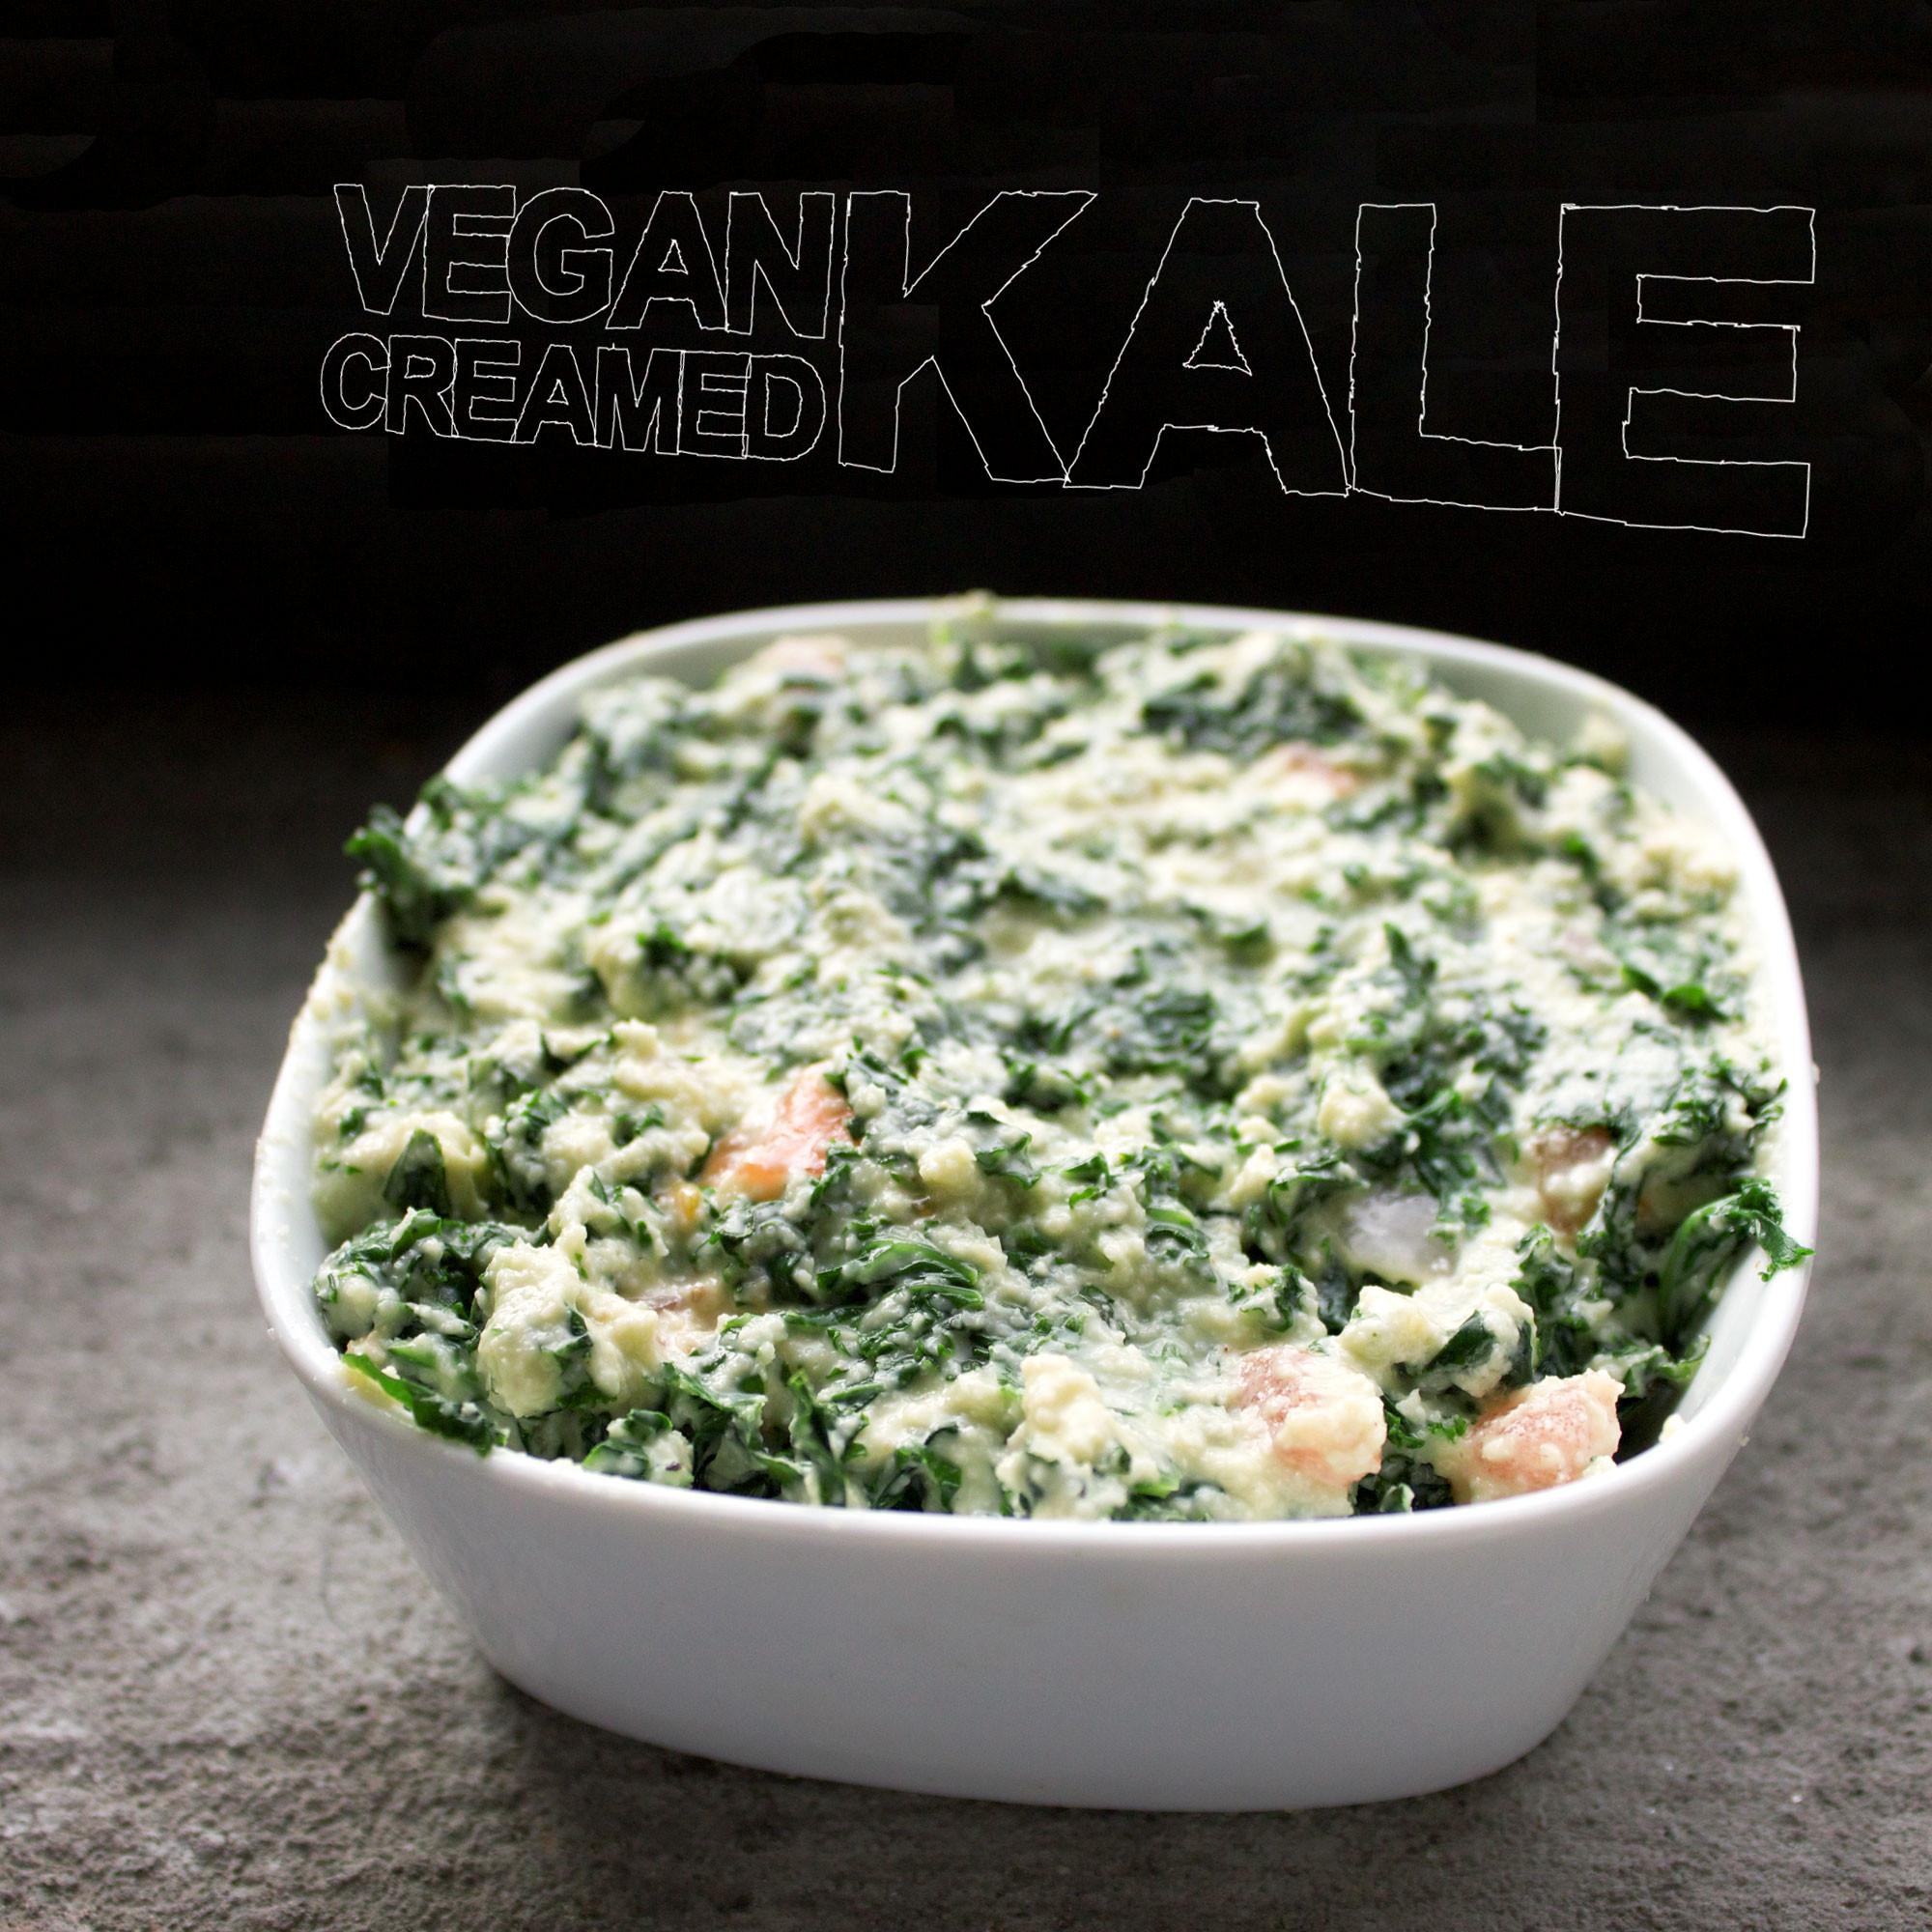 Kale Recipes Vegan  Creamed Kale [vegan]